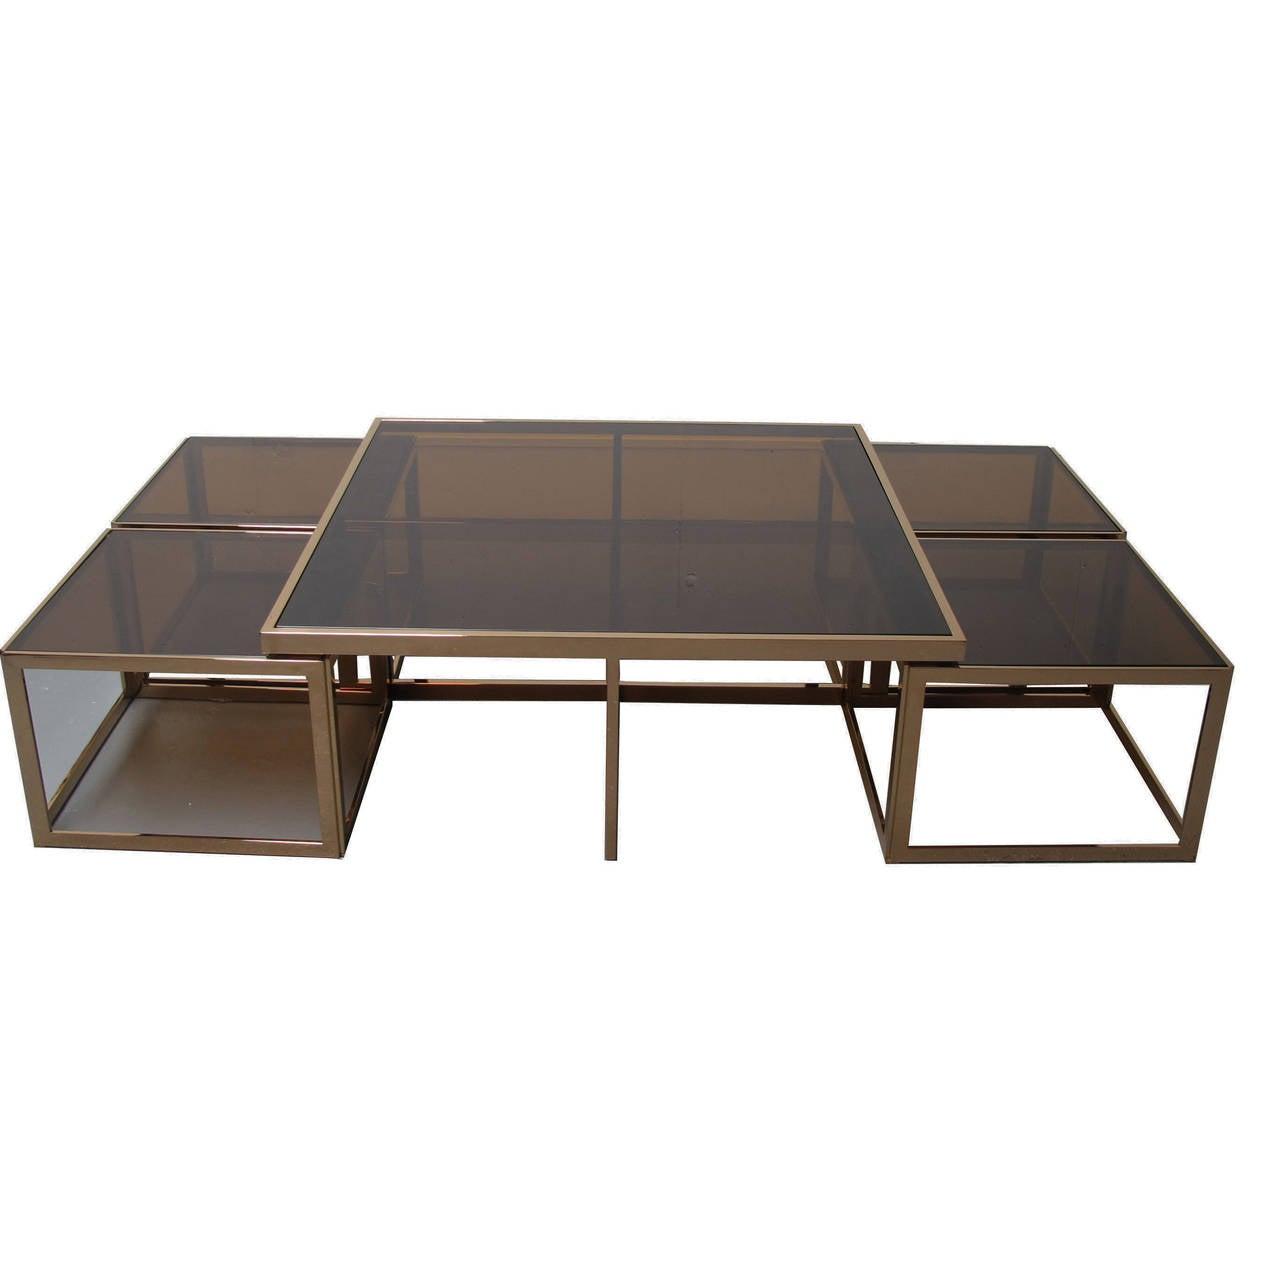 modular coffee table at 1stdibs bramblecrest sahara modular sofa with modular coffee table